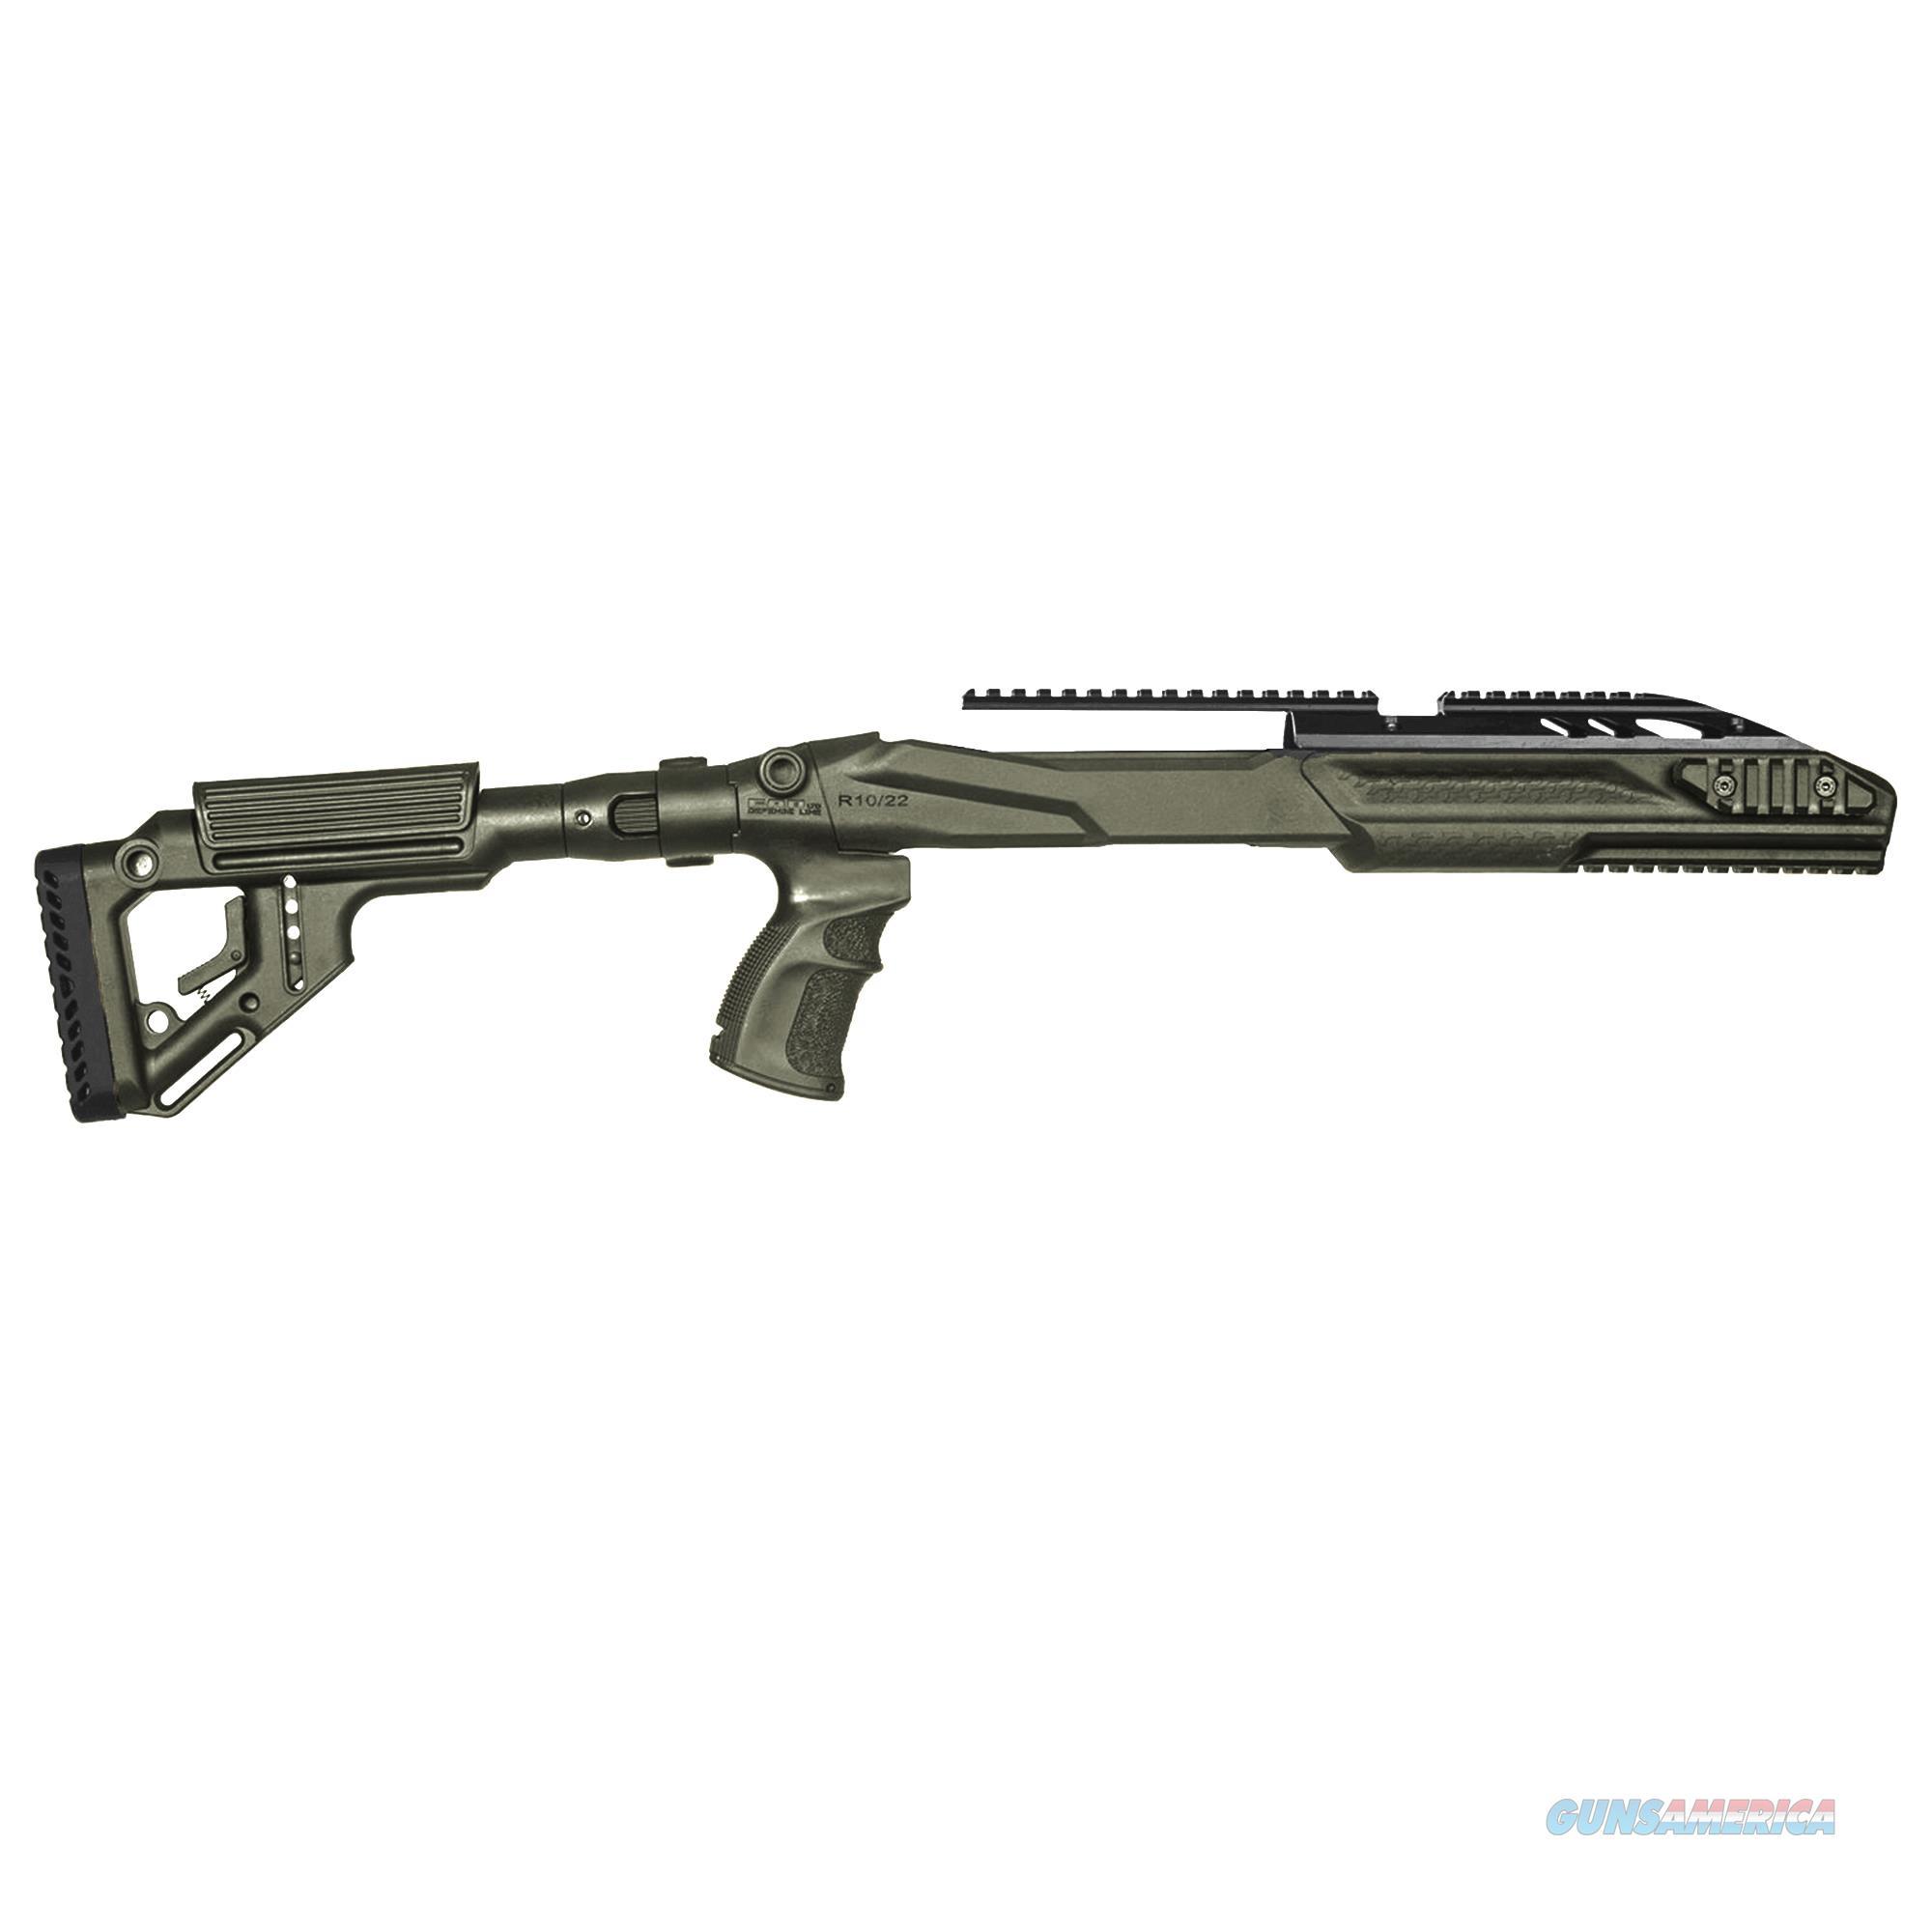 Mako Group Ruger 10/22 Uas Precision Stock Pro Conversion Kit UAS PRO R10/22-OD  Non-Guns > Gunstocks, Grips & Wood